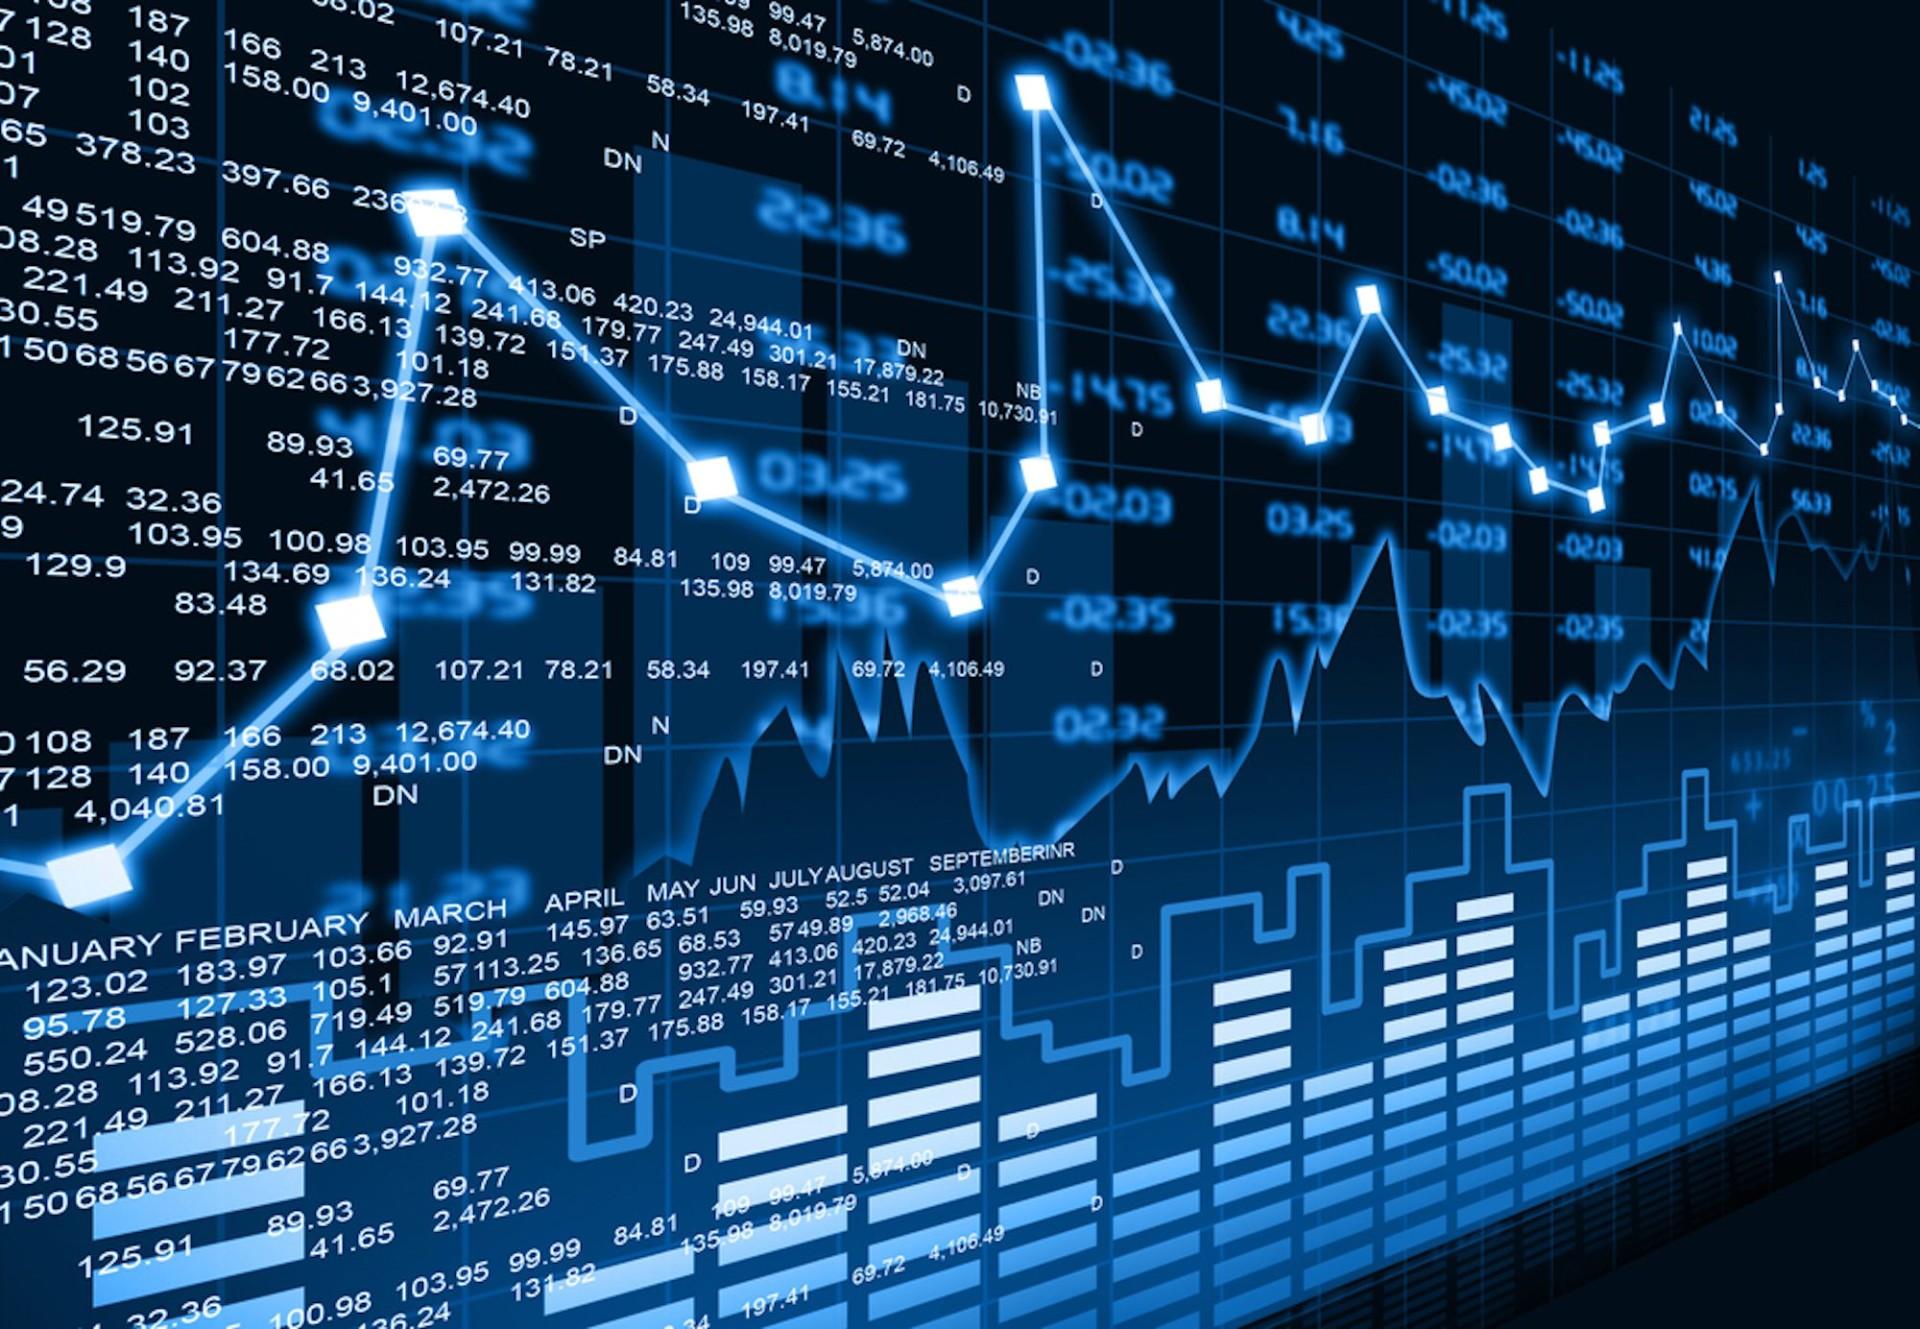 NASDAQ: WBA | Walgreens Boots Alliance, Inc. News, Ratings, and Charts